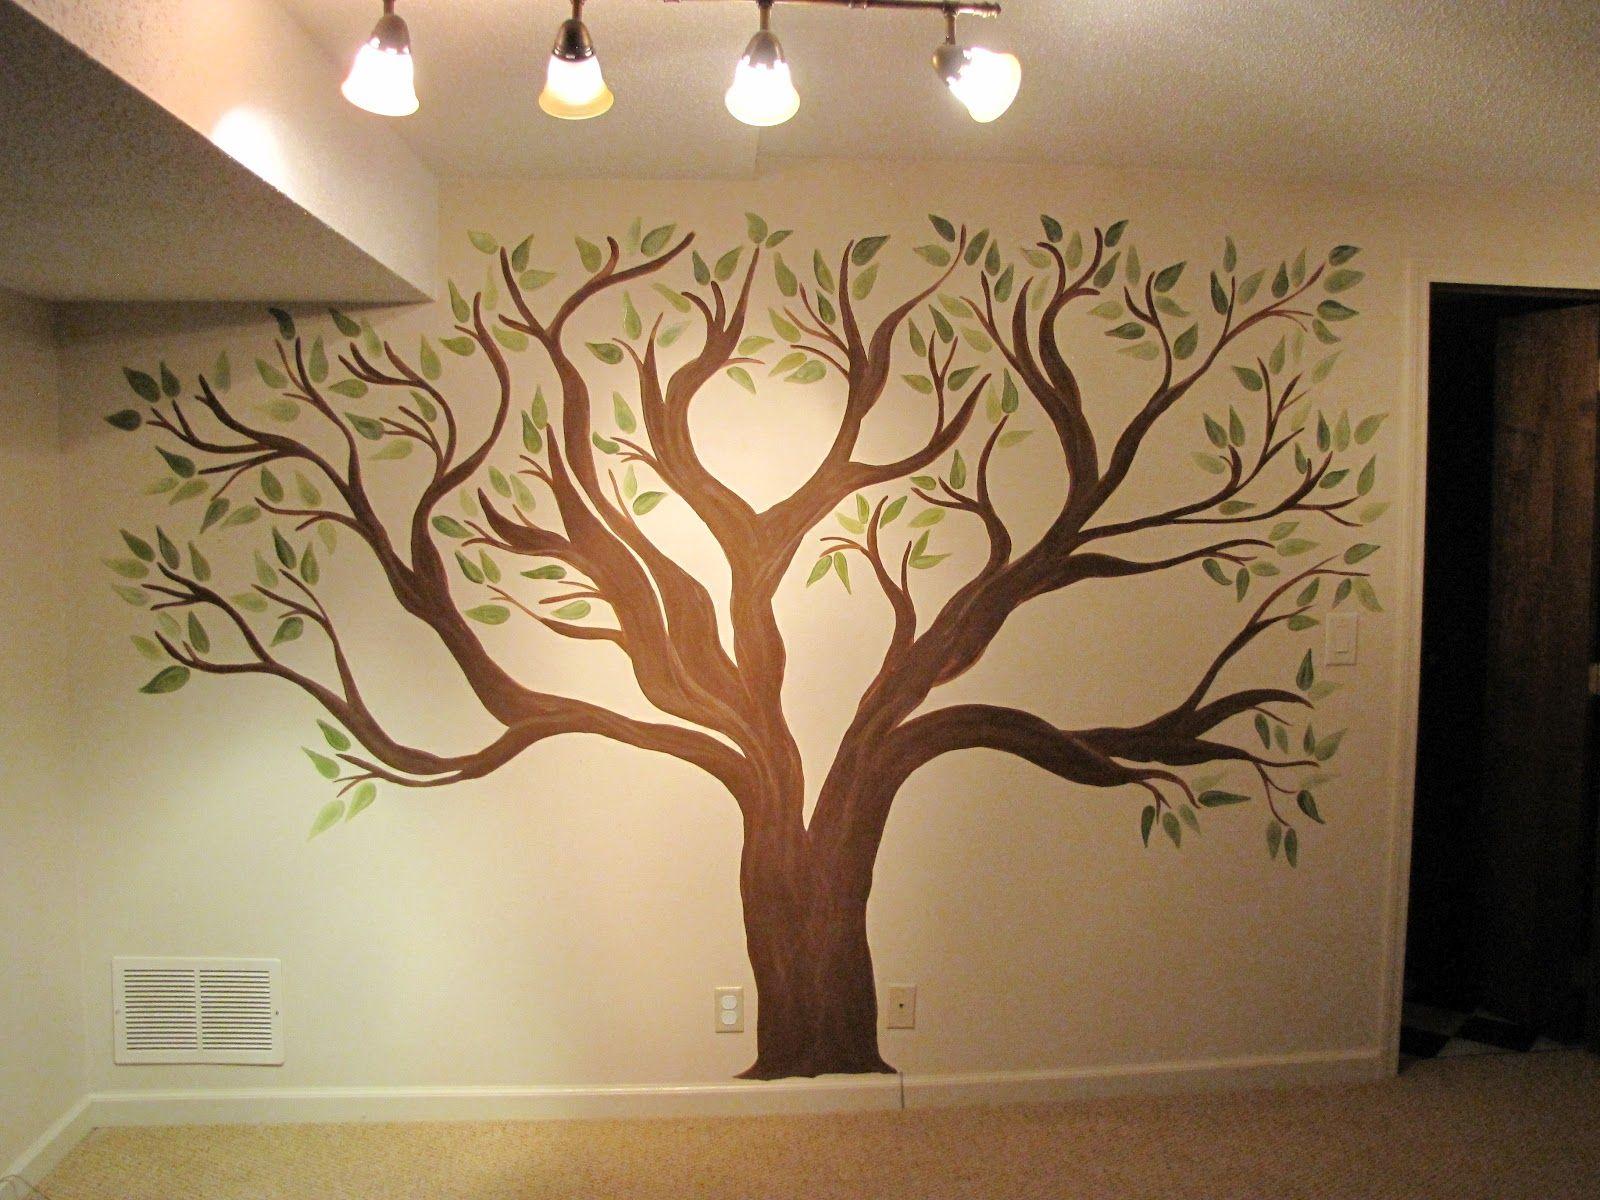 Creative Genius Art Family Tree Wall Mural Family Tree Wall Art Tree Wall Murals Tree Mural Diy